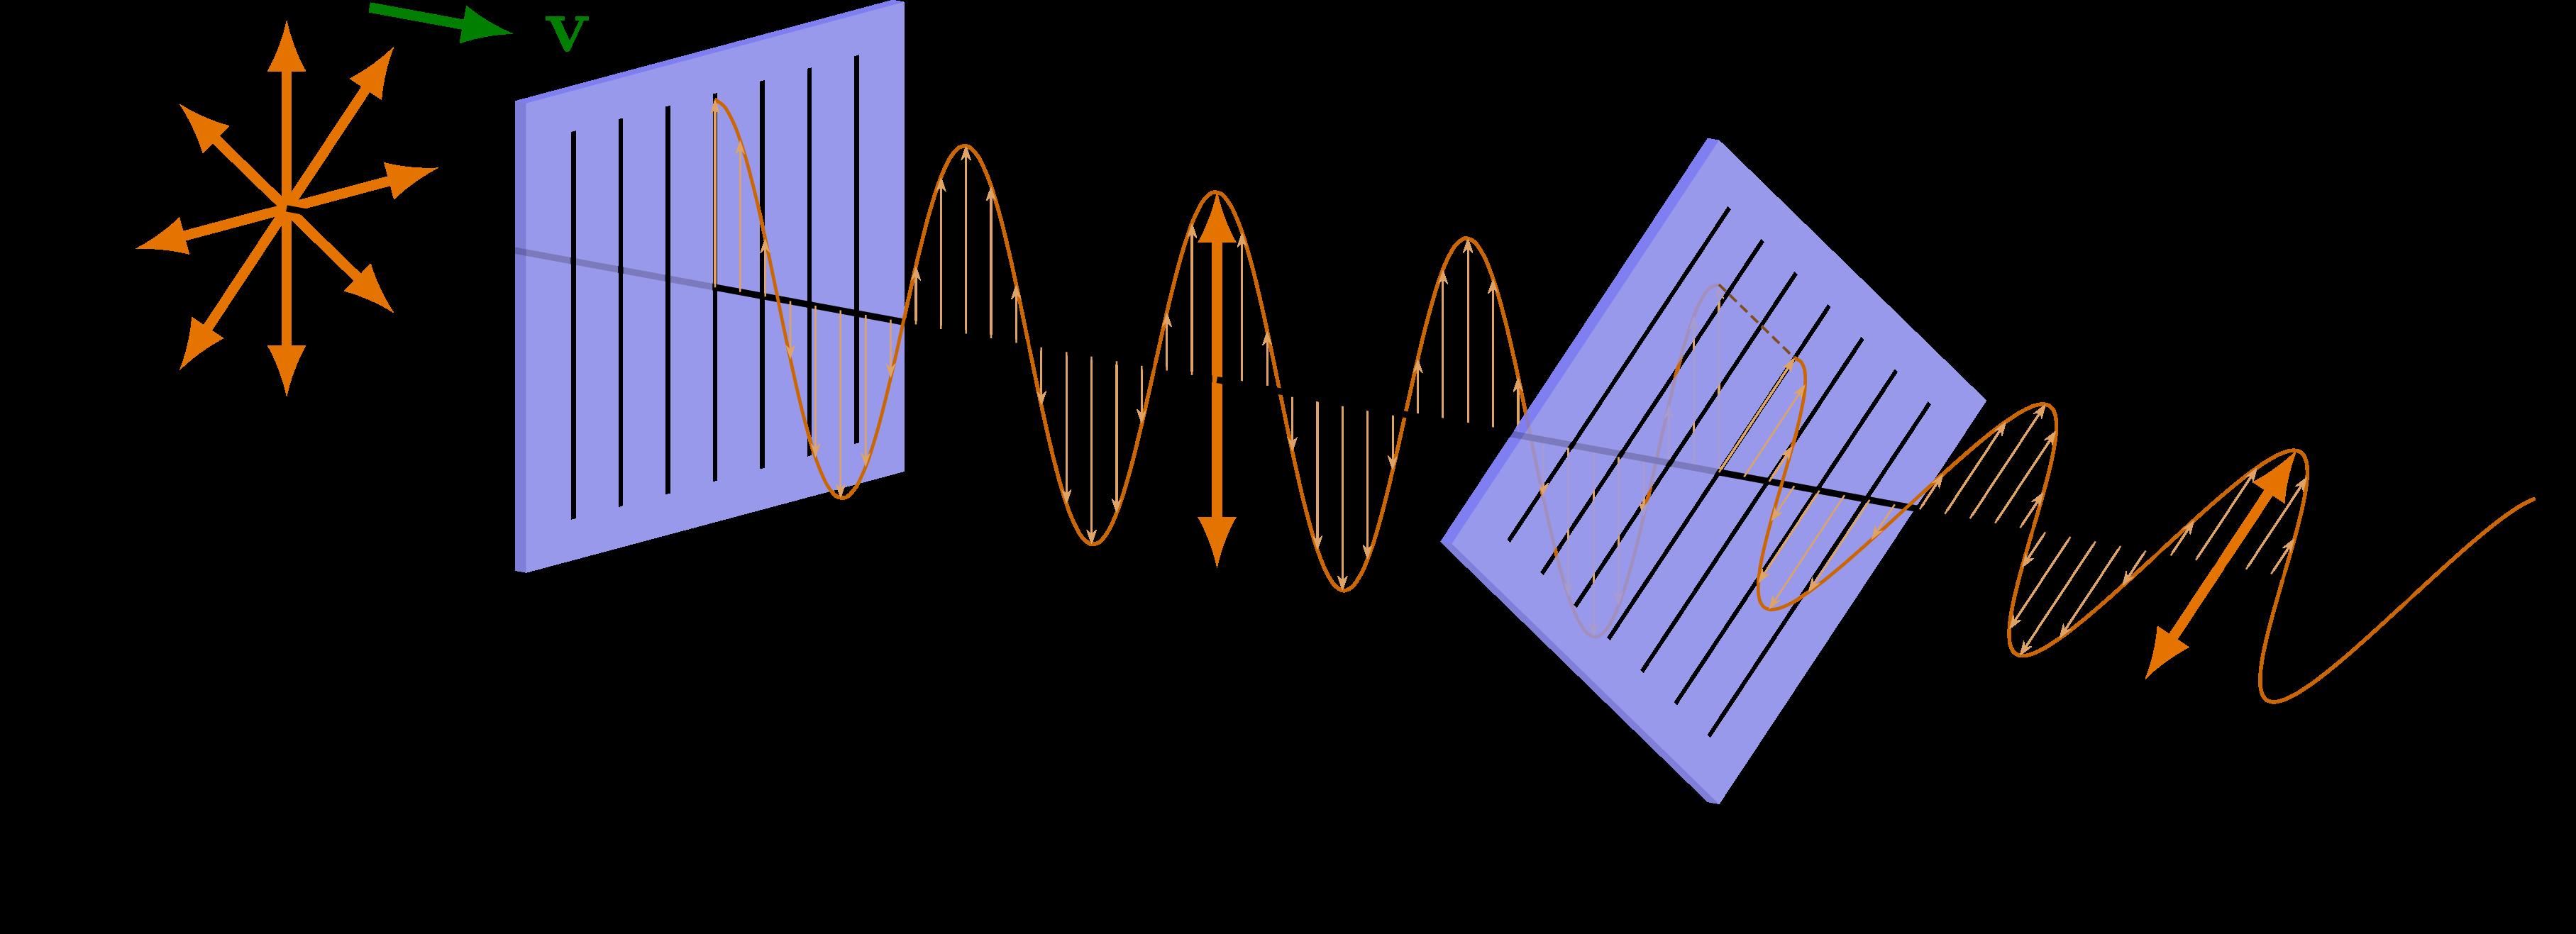 optics_polarization-001.png